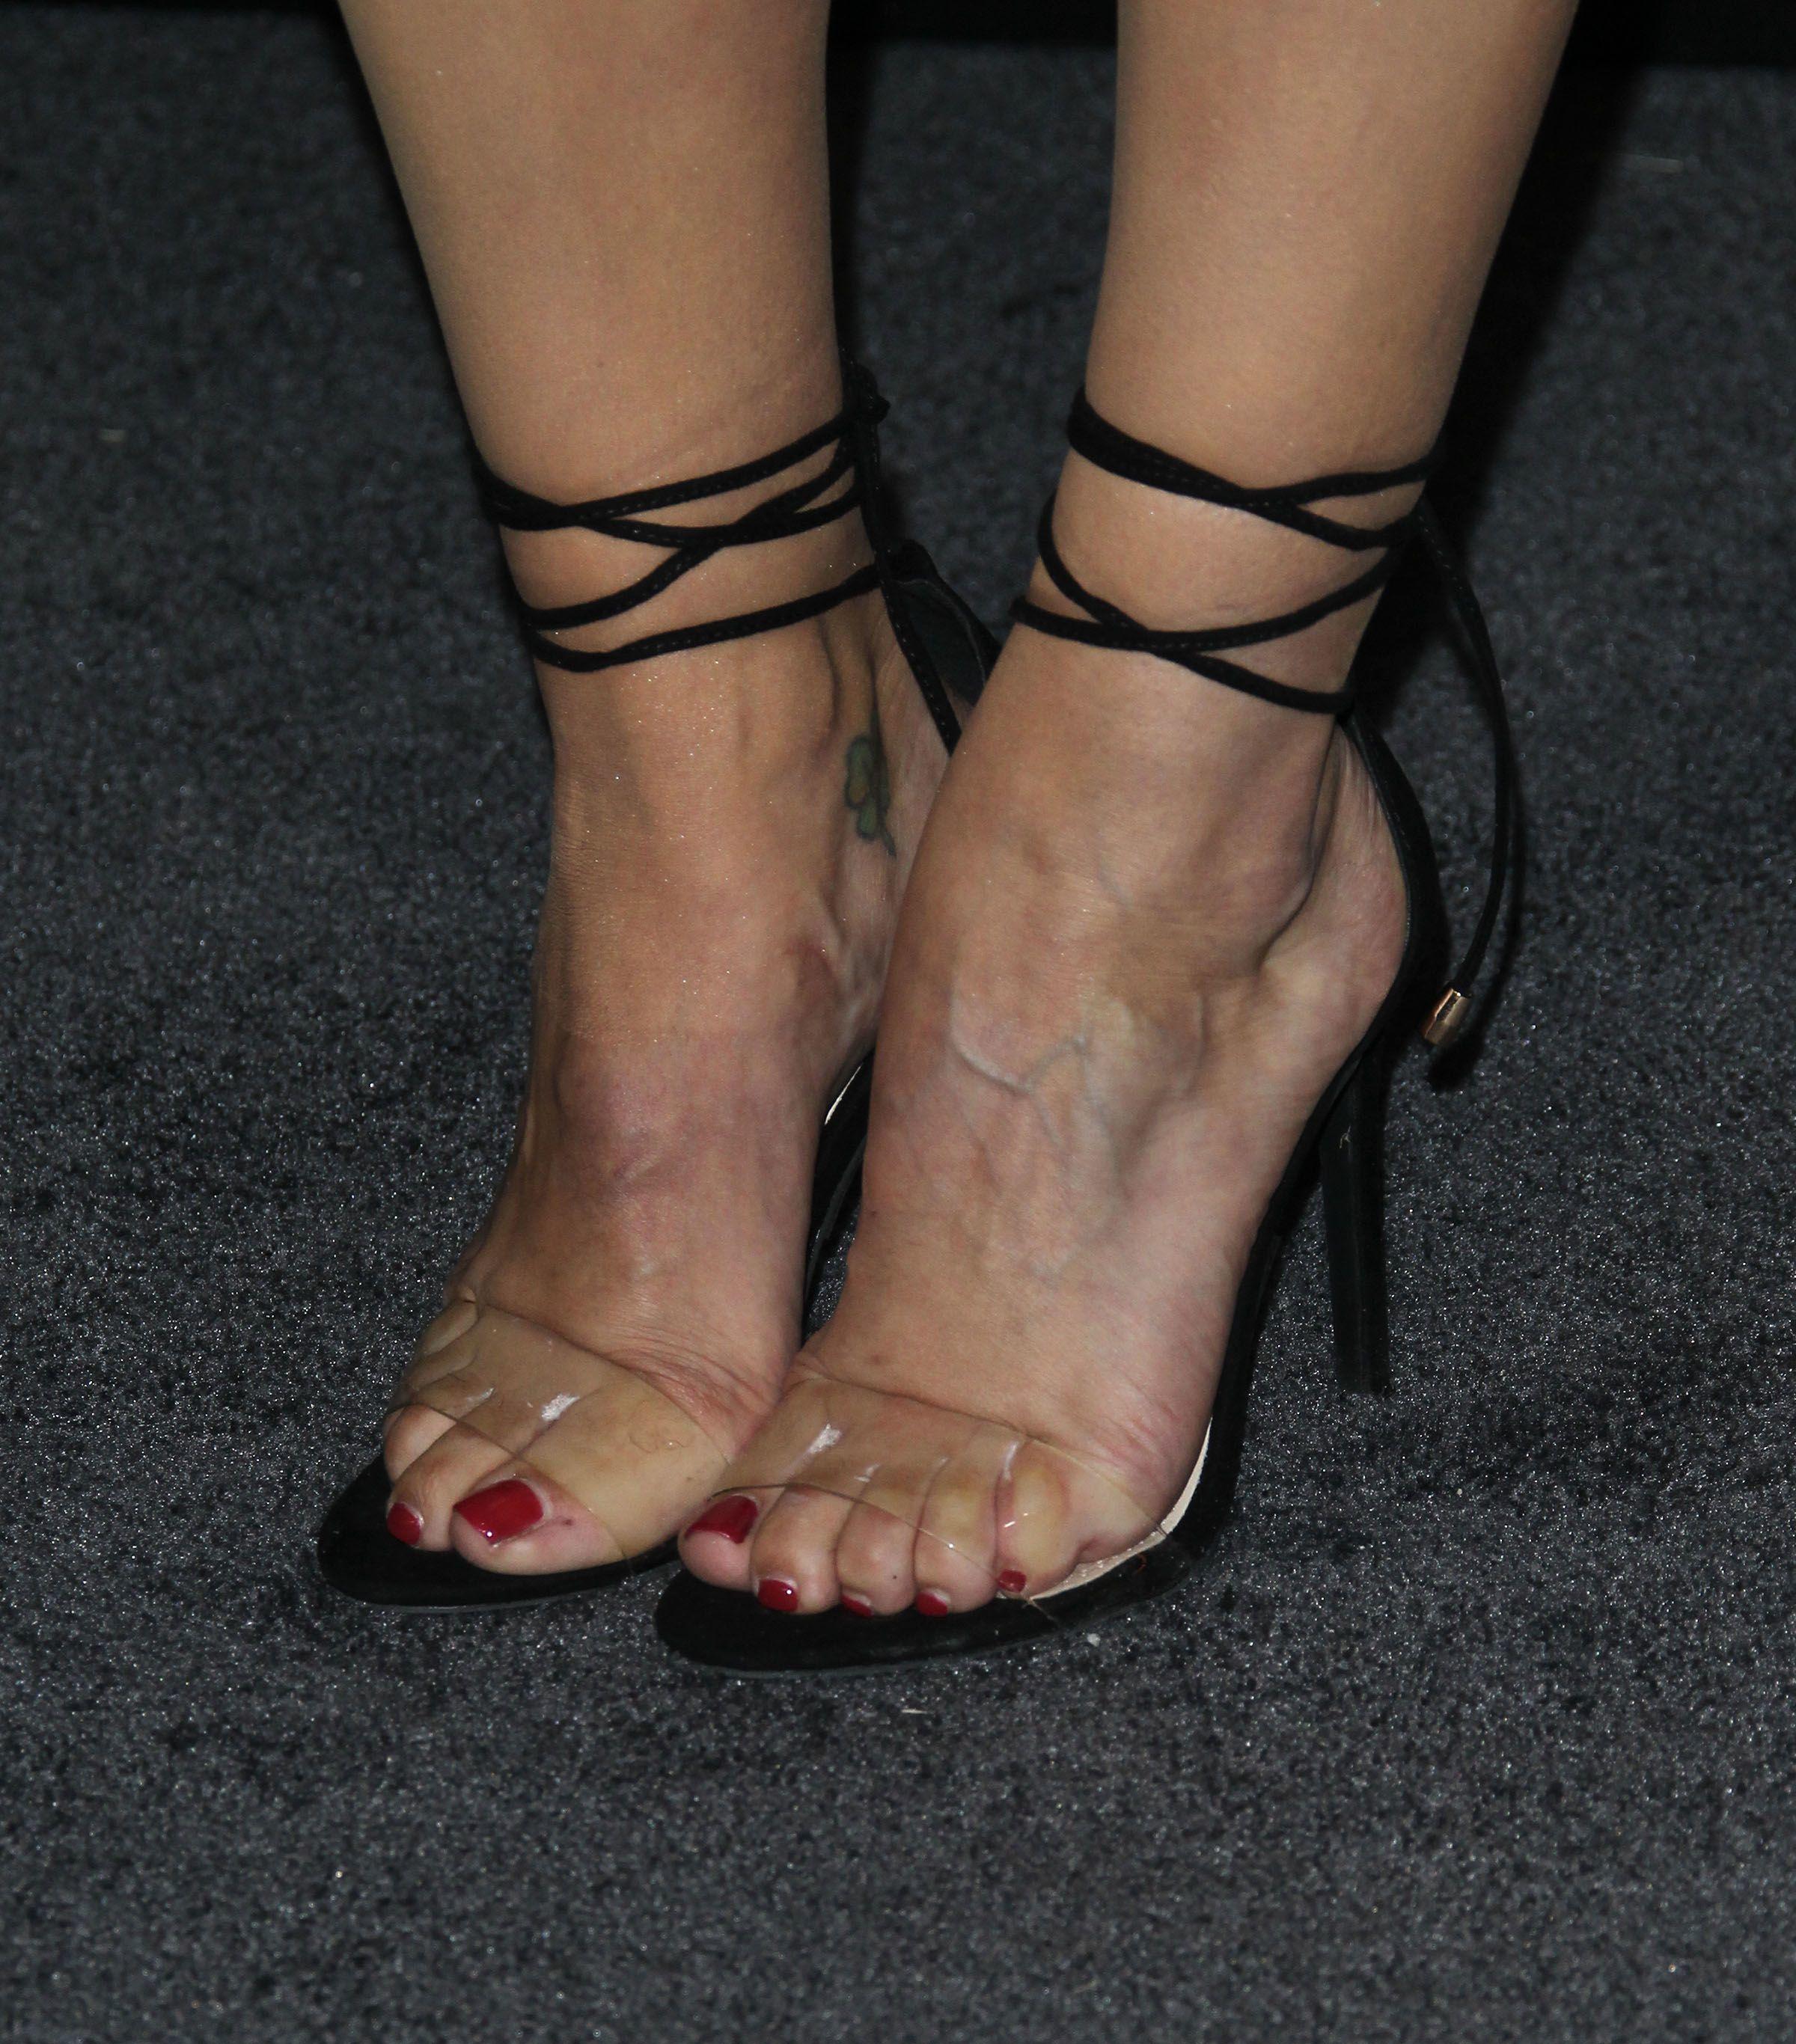 Feet Scheana Marie naked (47 photos), Instagram